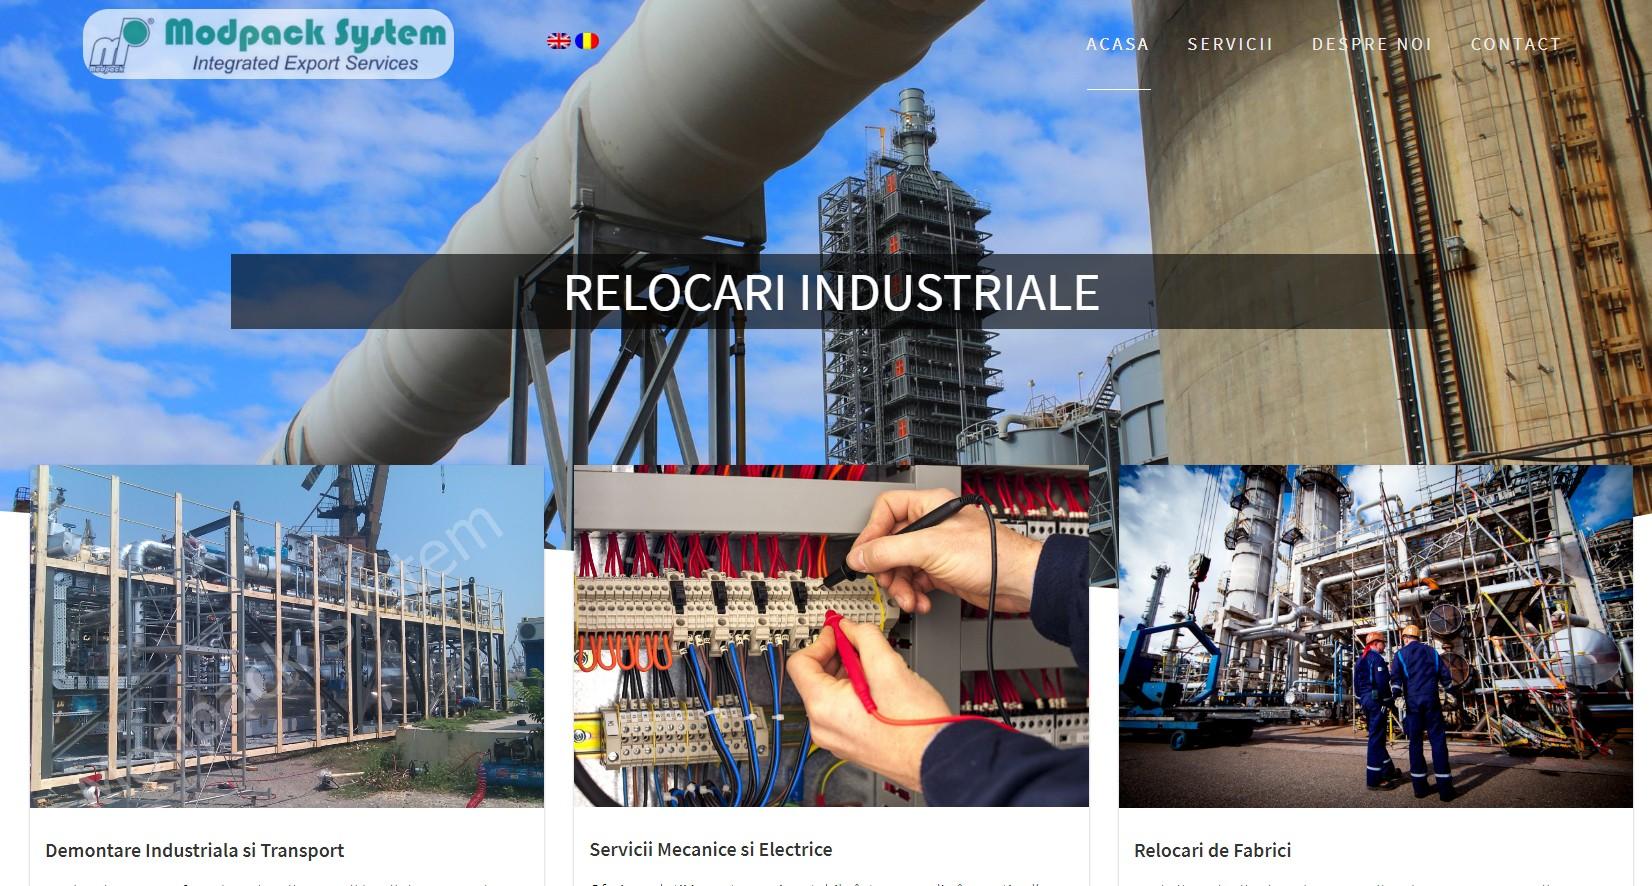 Relocari Industriale